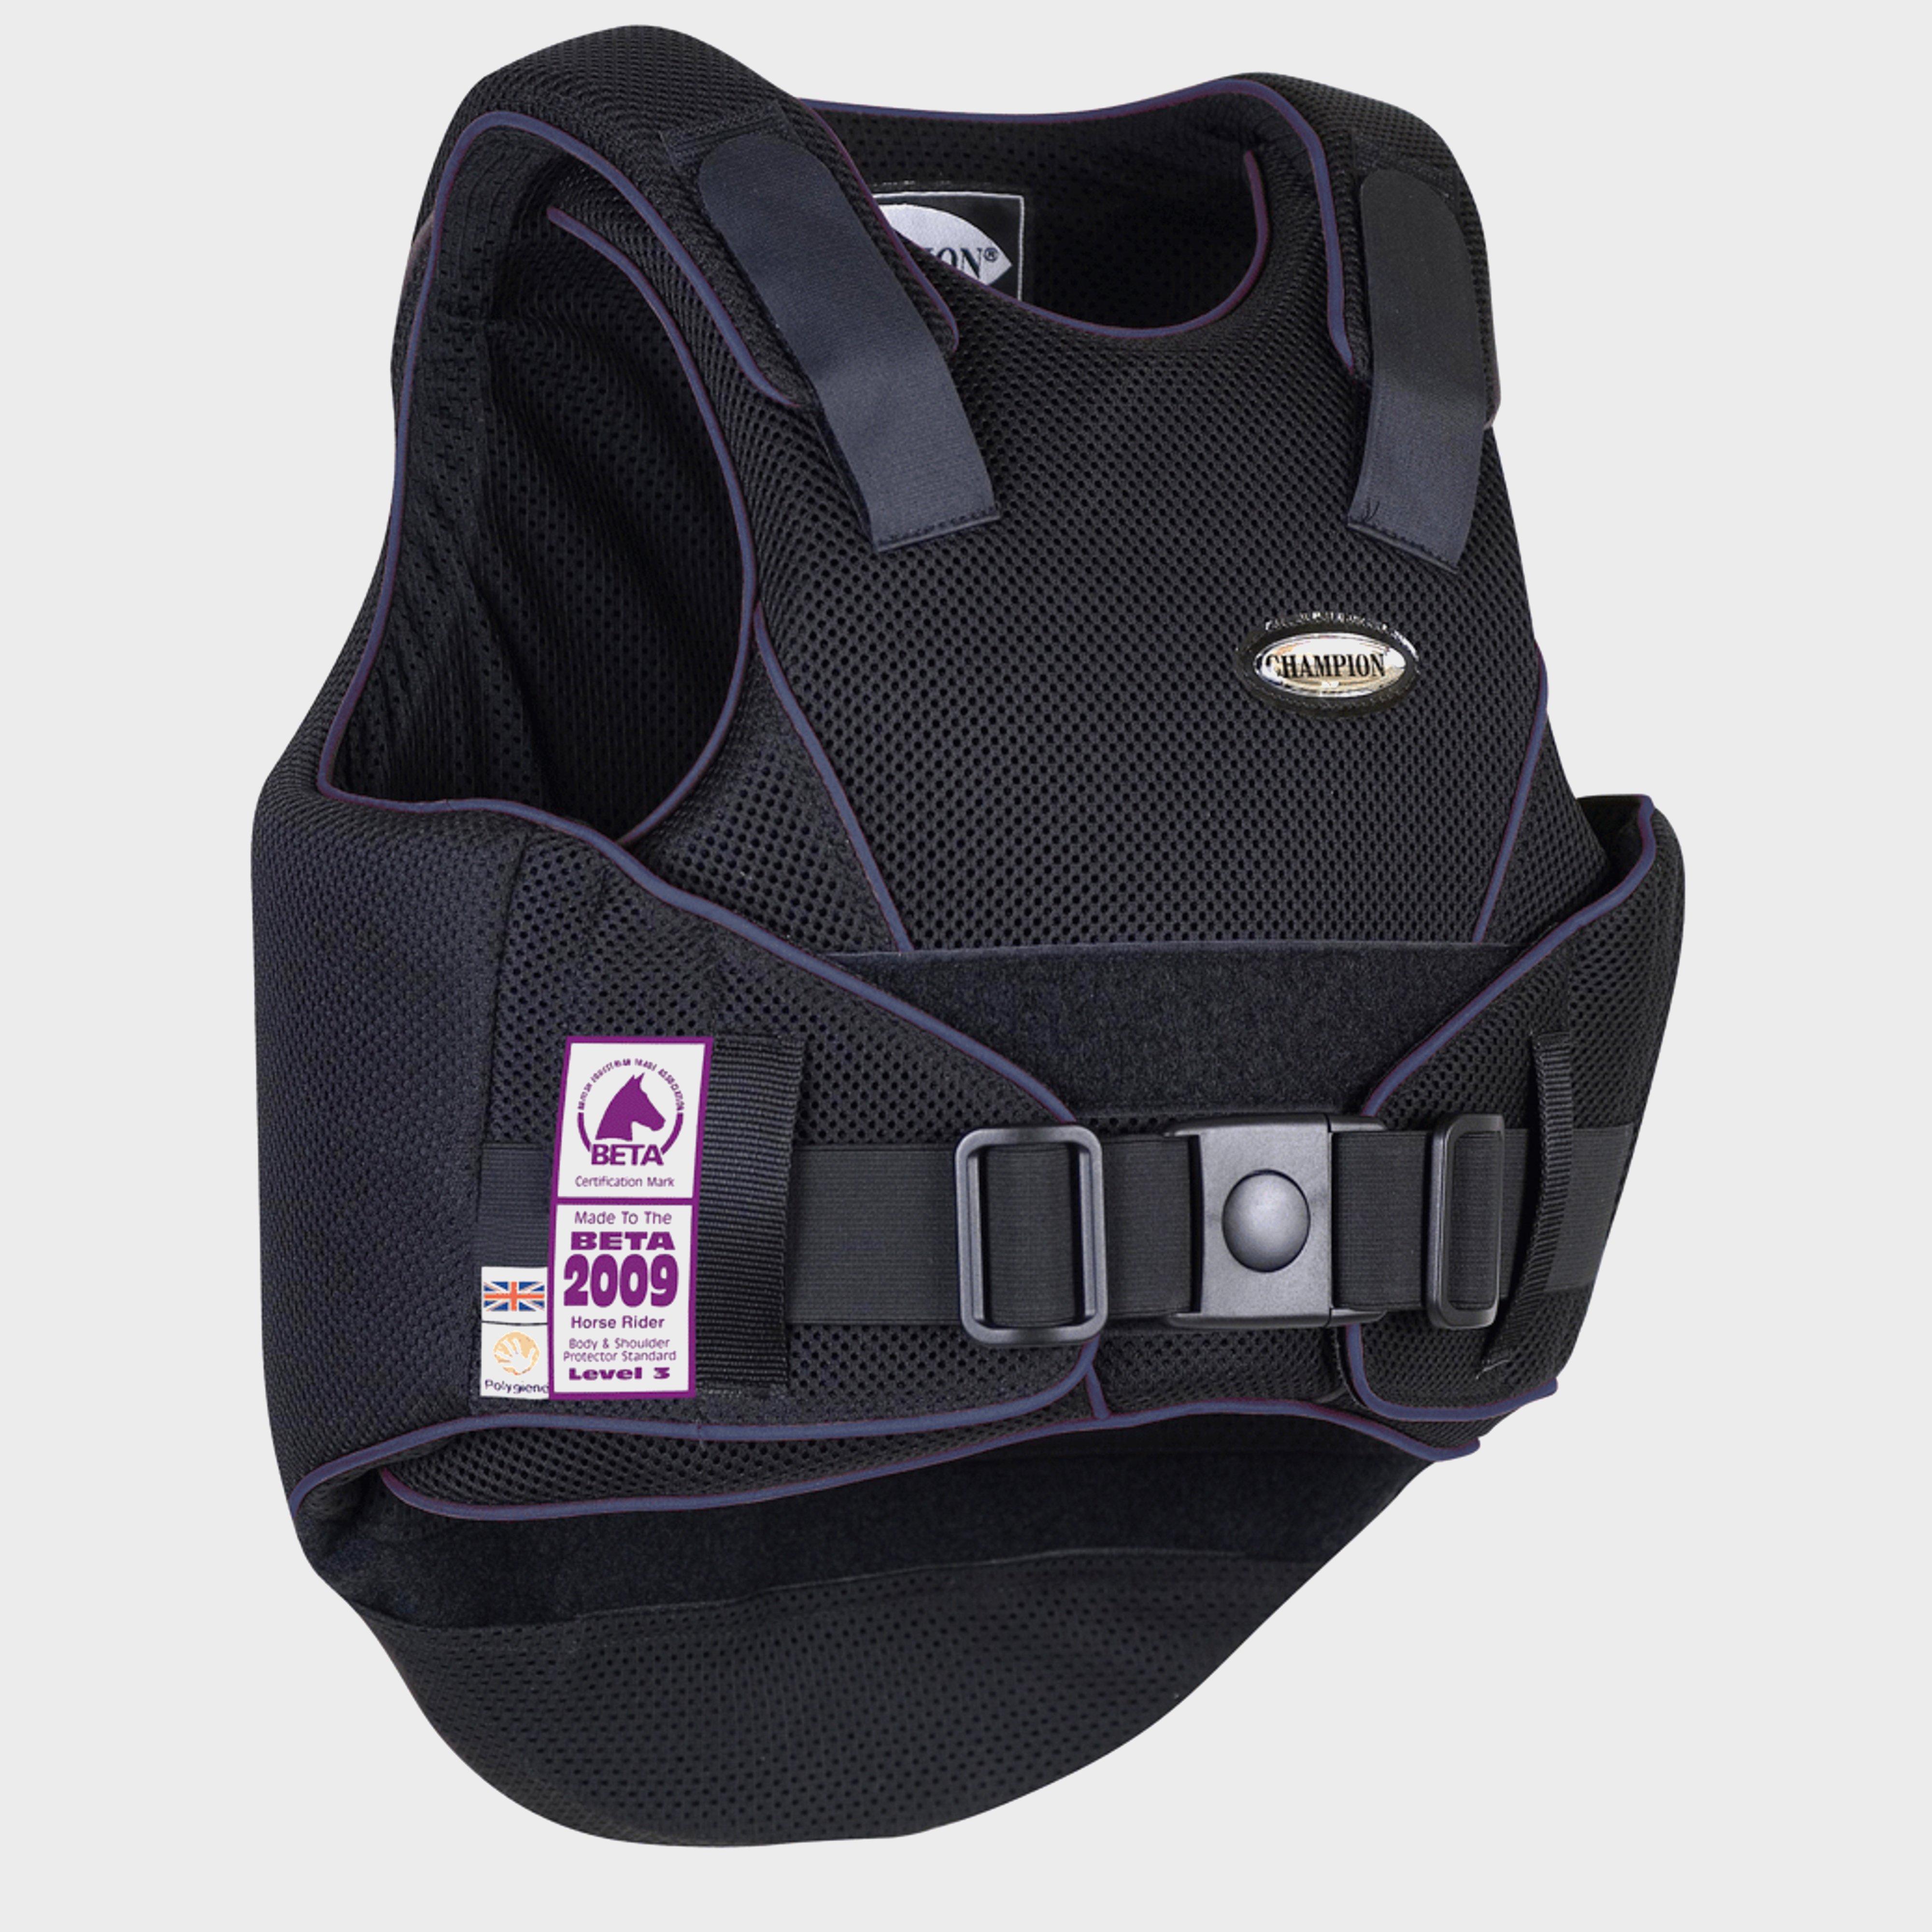 Champion Flexair Body Protector (small) - Black/[xl]  Black/[xl]